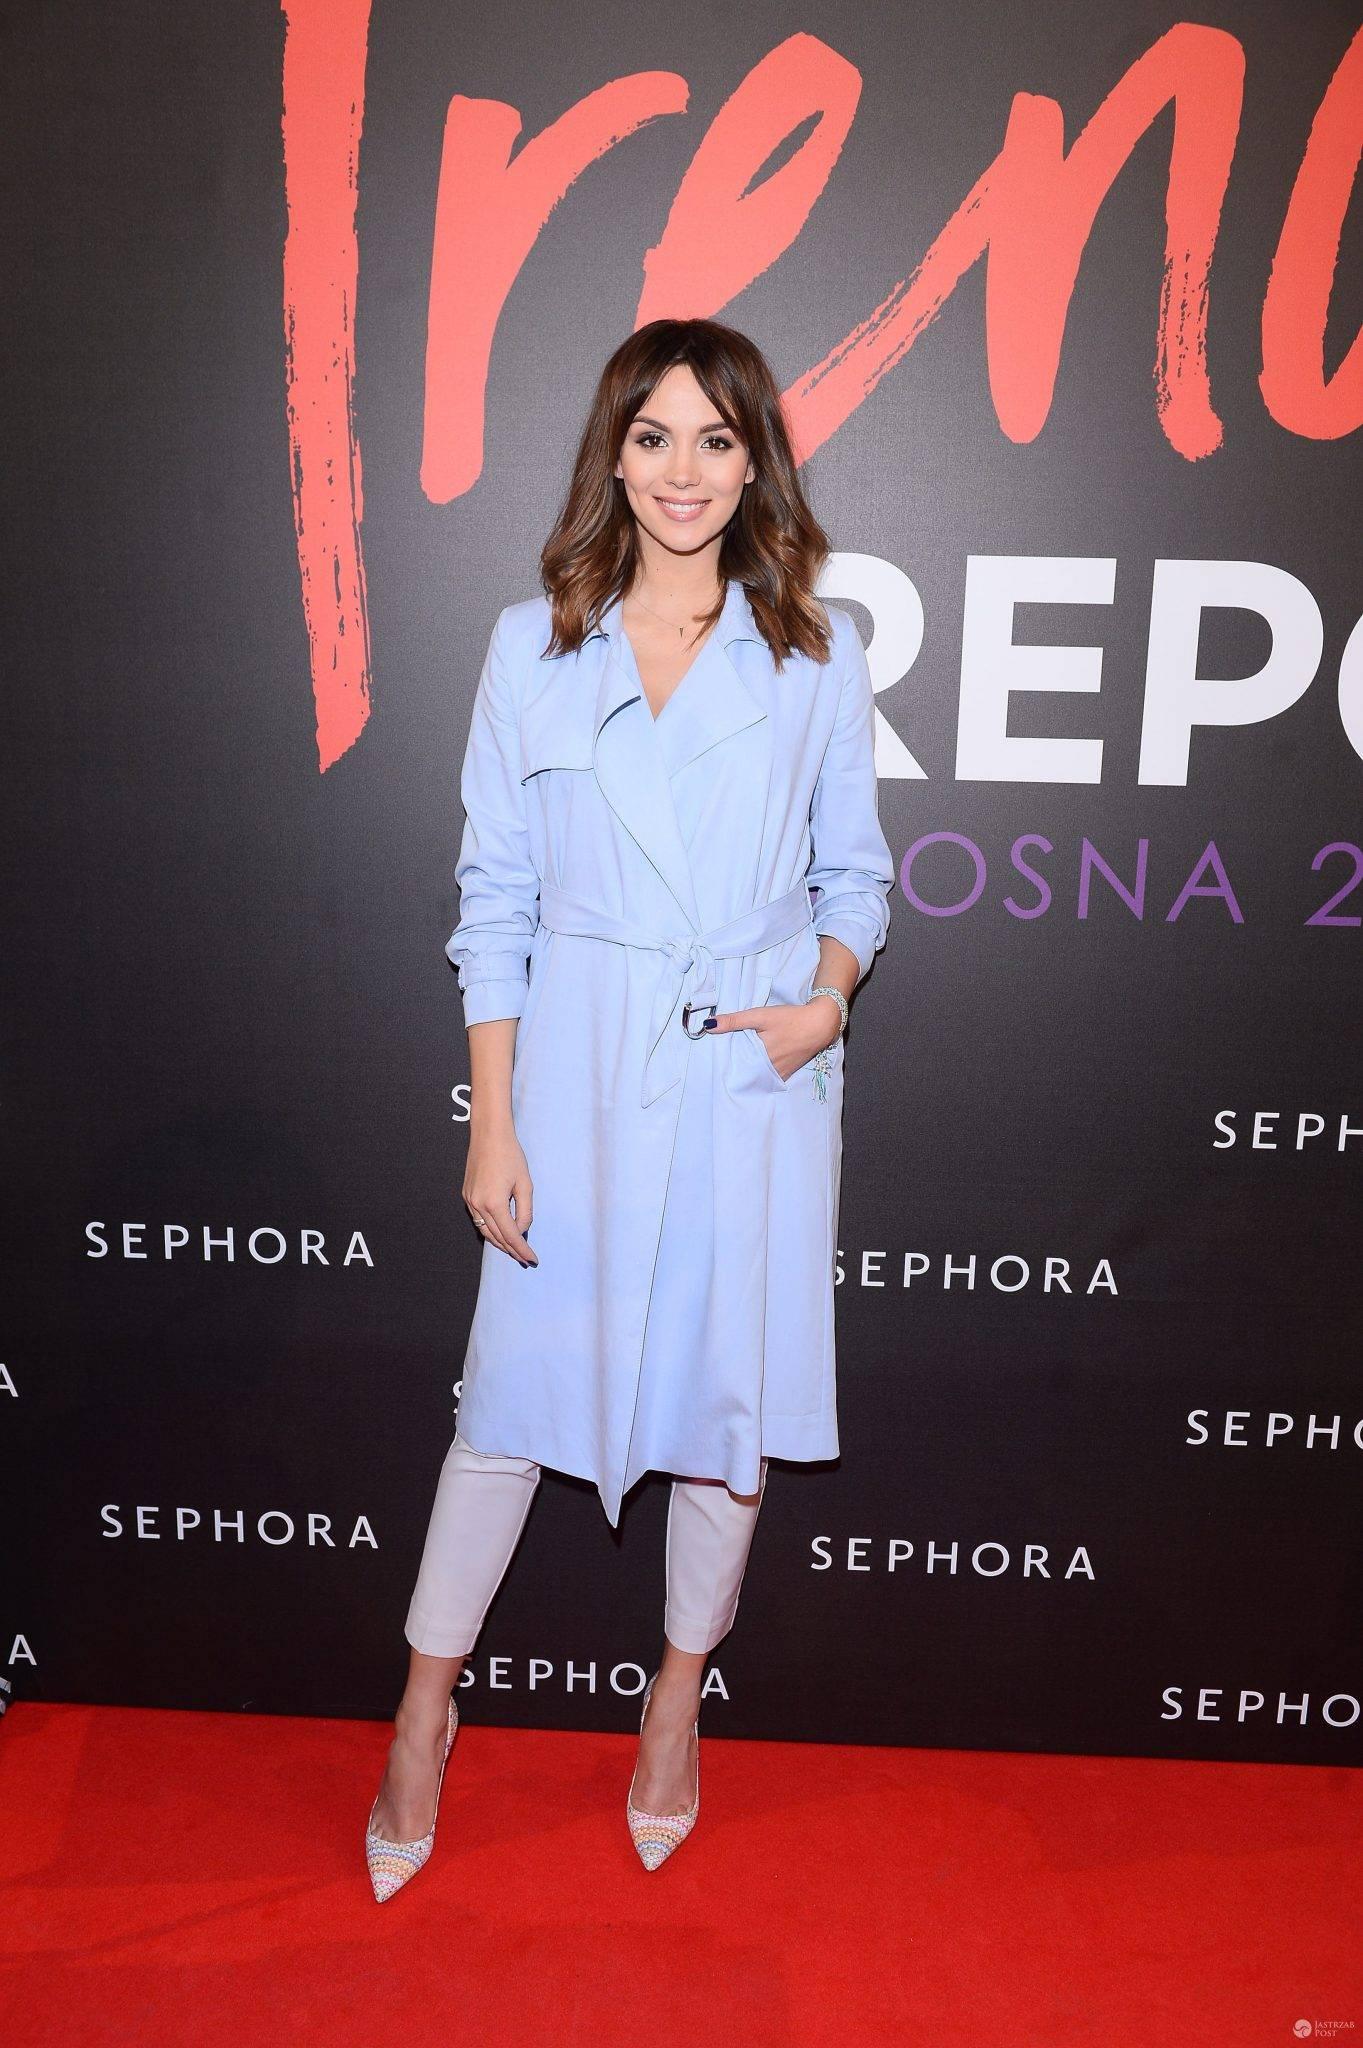 Paulina Krupińska - Sephora Trend Report 2017